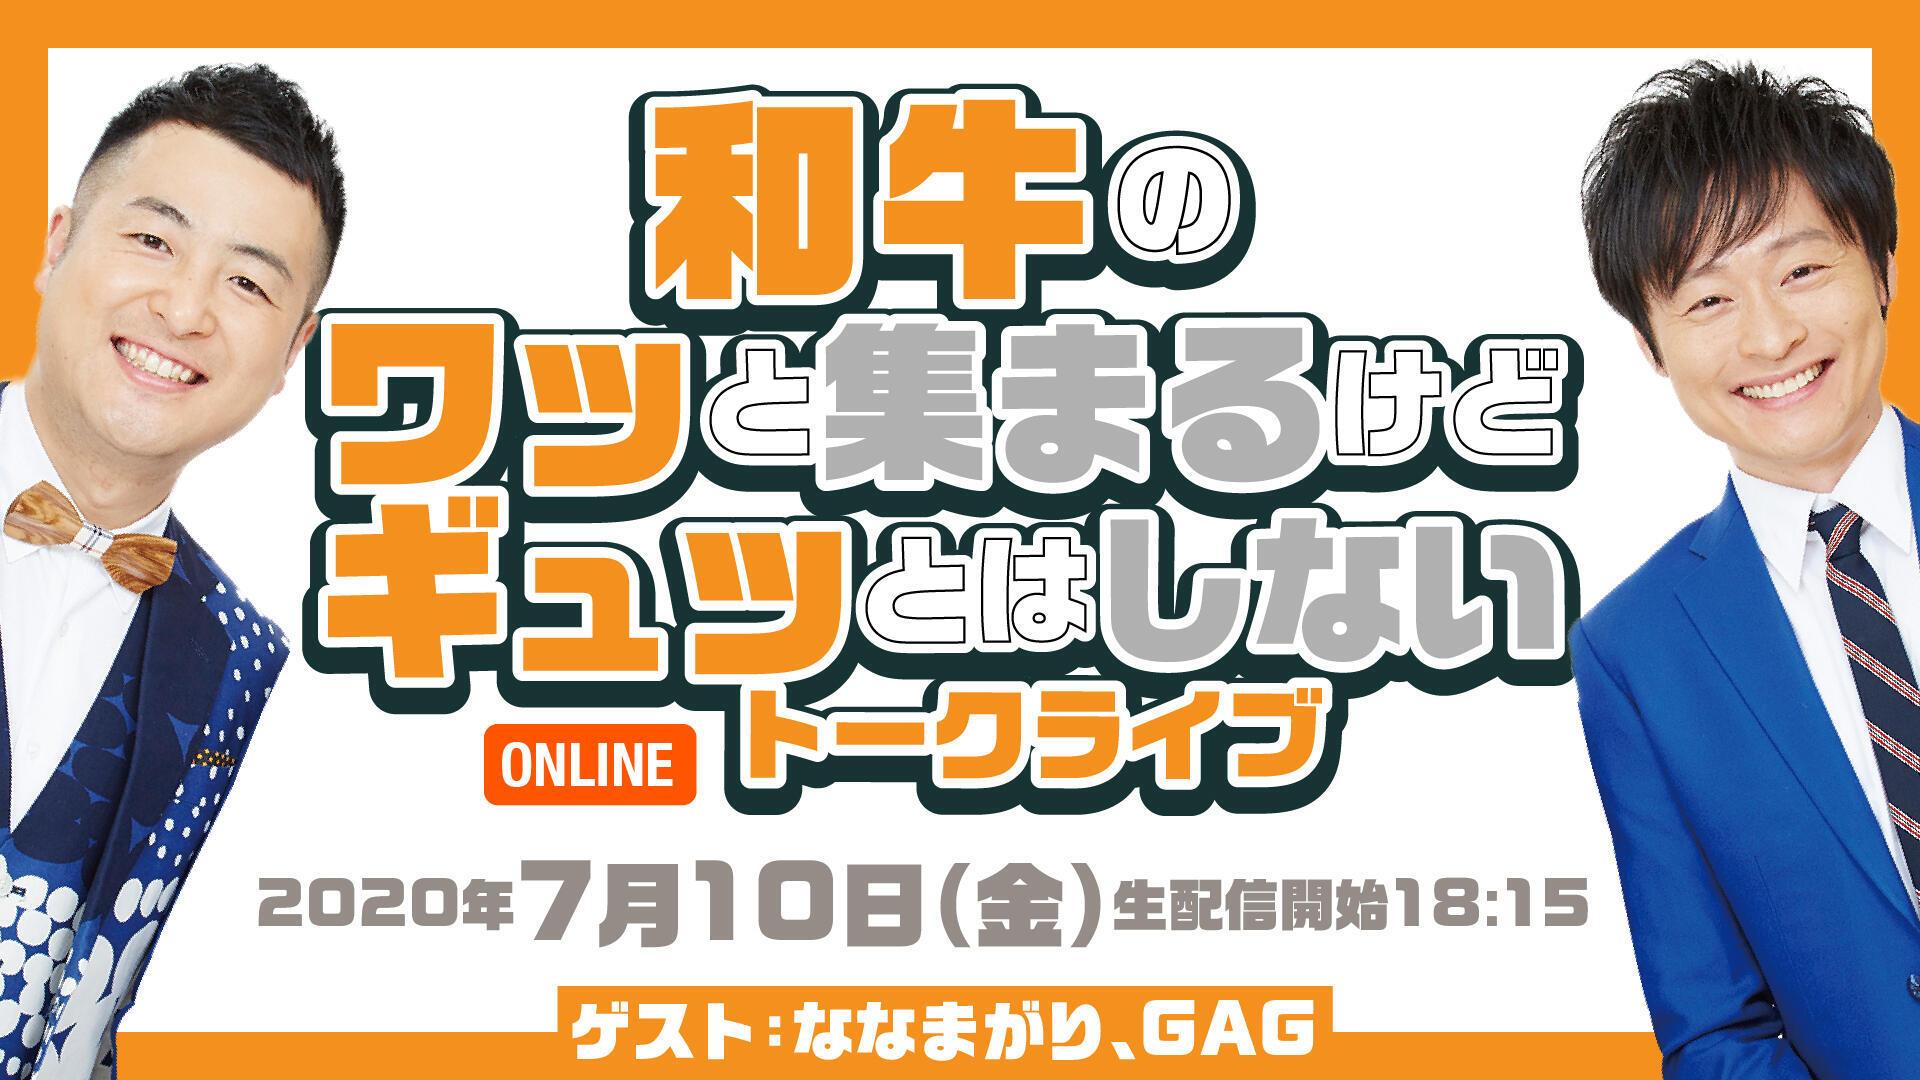 http://www.syumatsu.jp/20200622175313-6e8c30b0beeca807b07410c5986c2a5d4c882b51.jpg